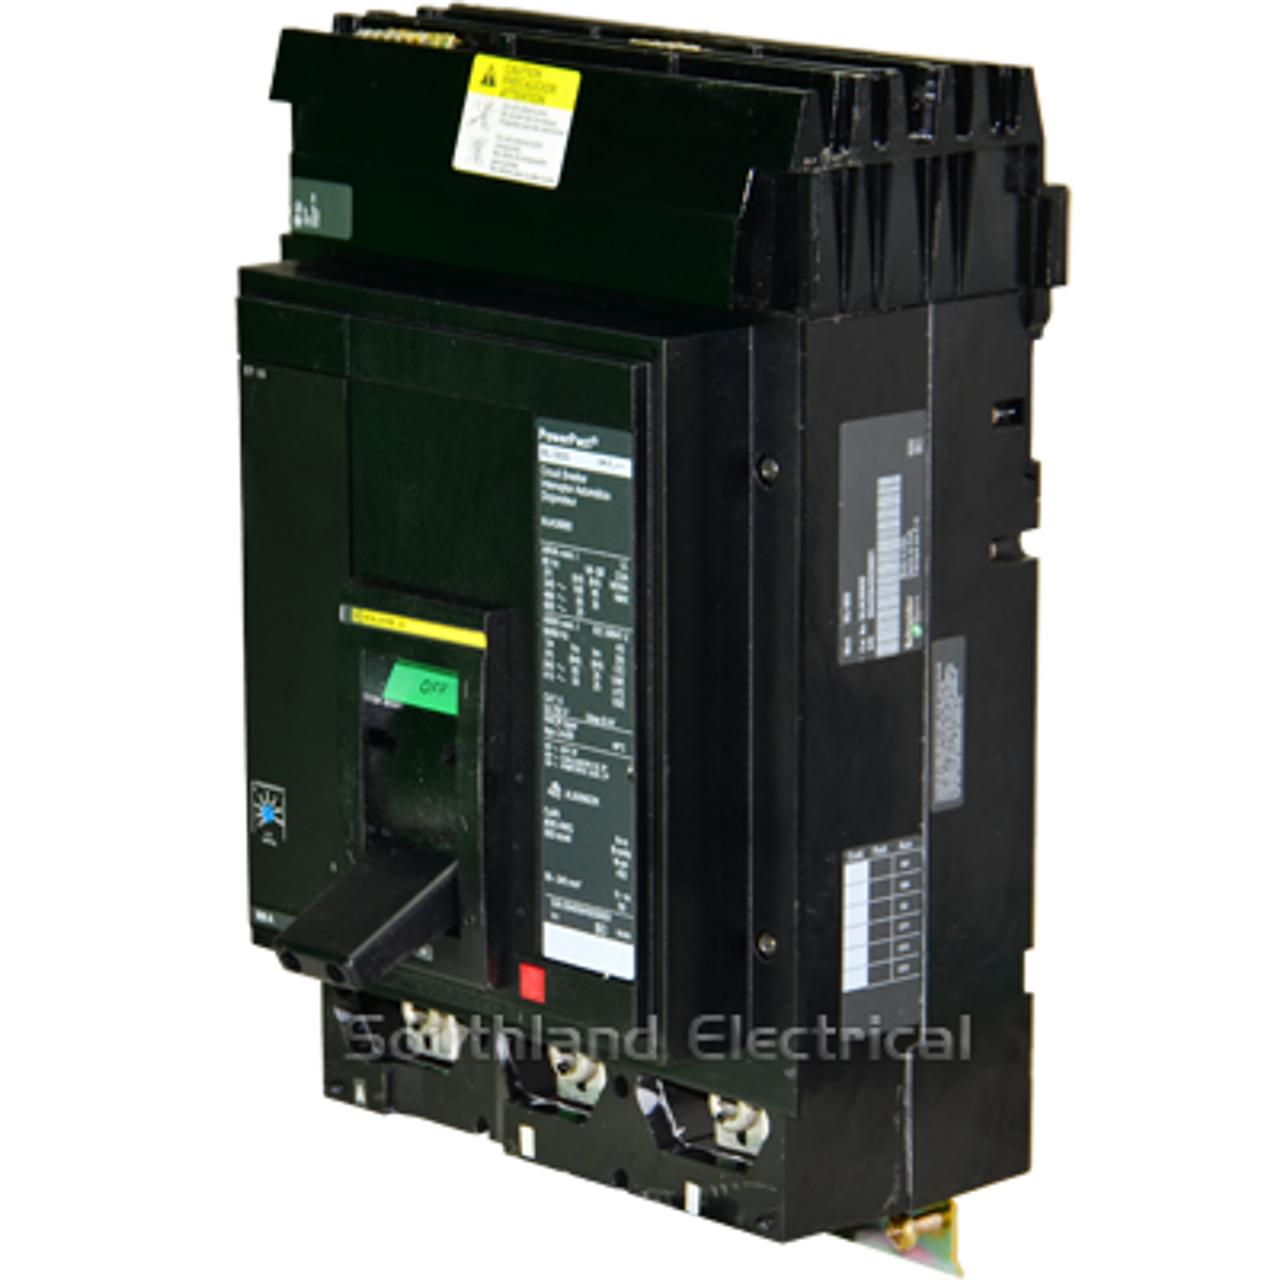 Square D MGA266002 2 Pole 600 Amp 600V Circuit Breaker - Used